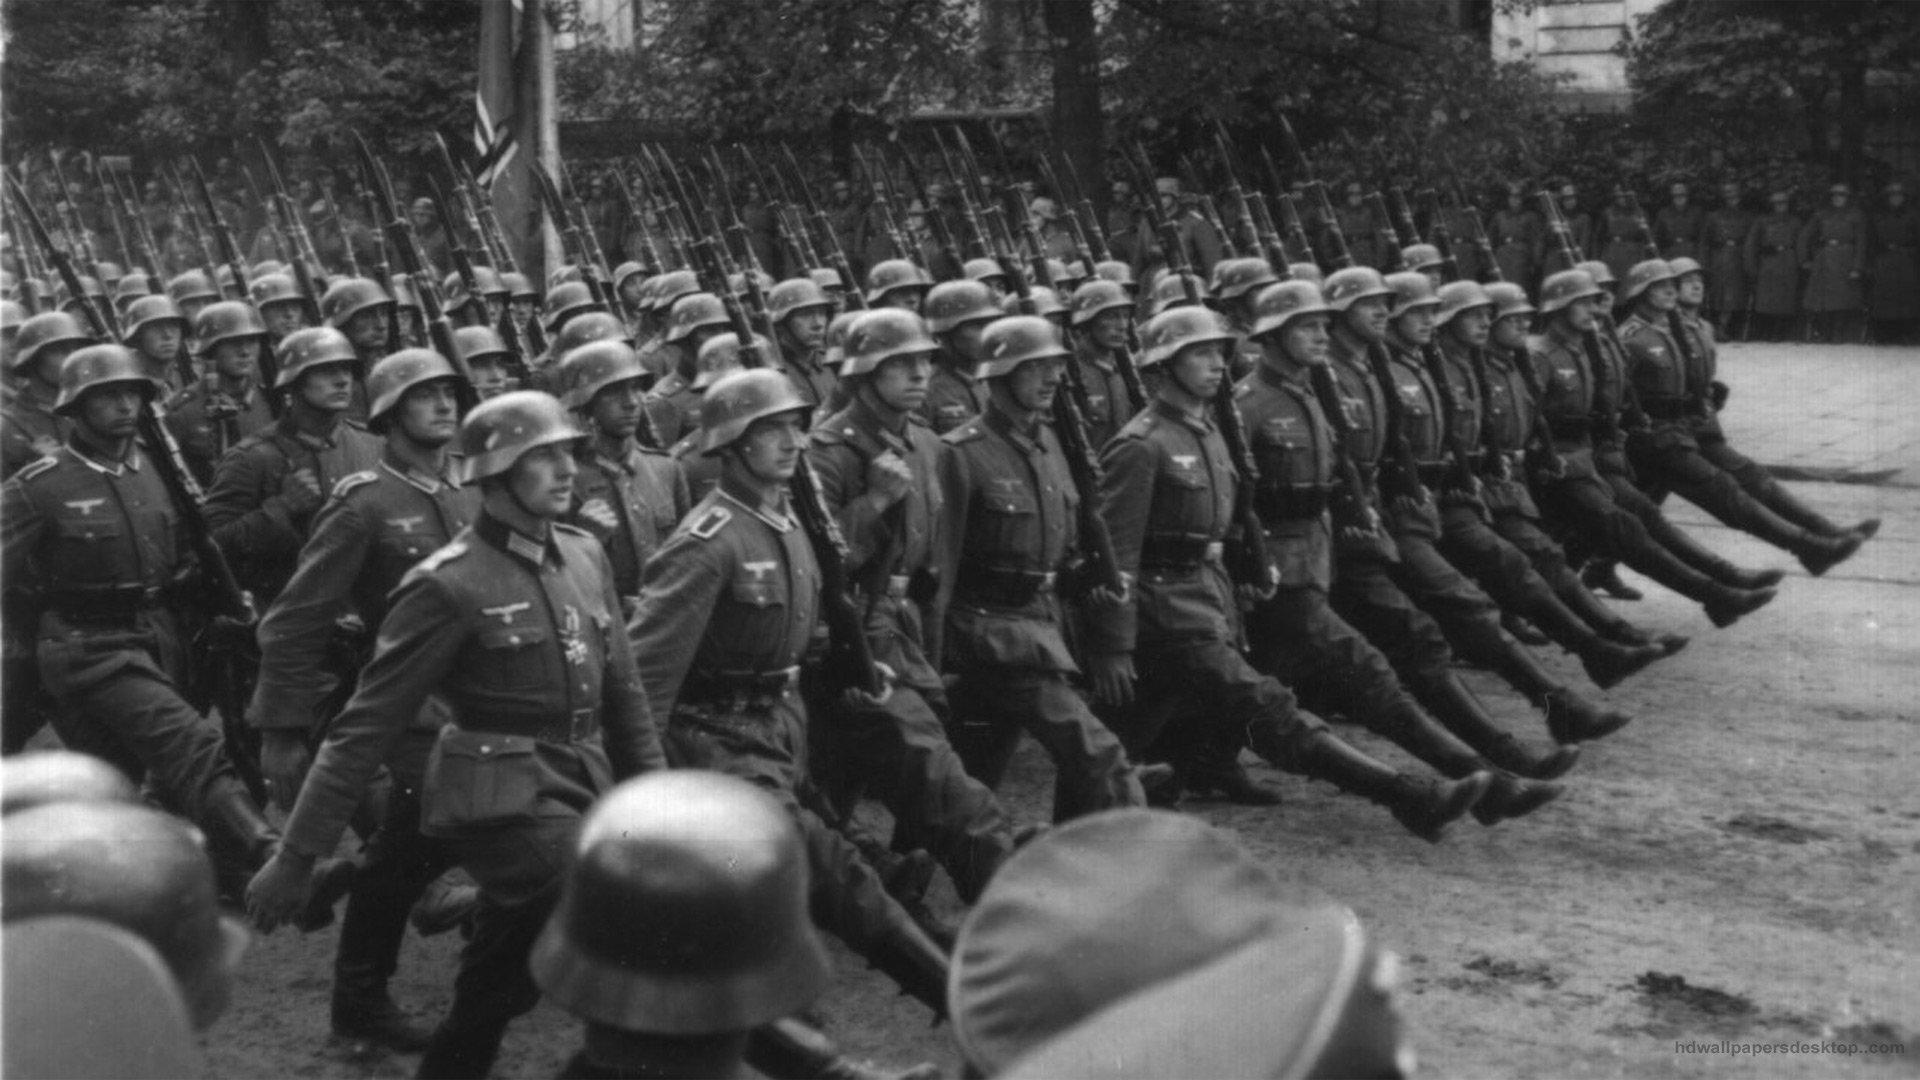 ww2 german army wallpaper - photo #38